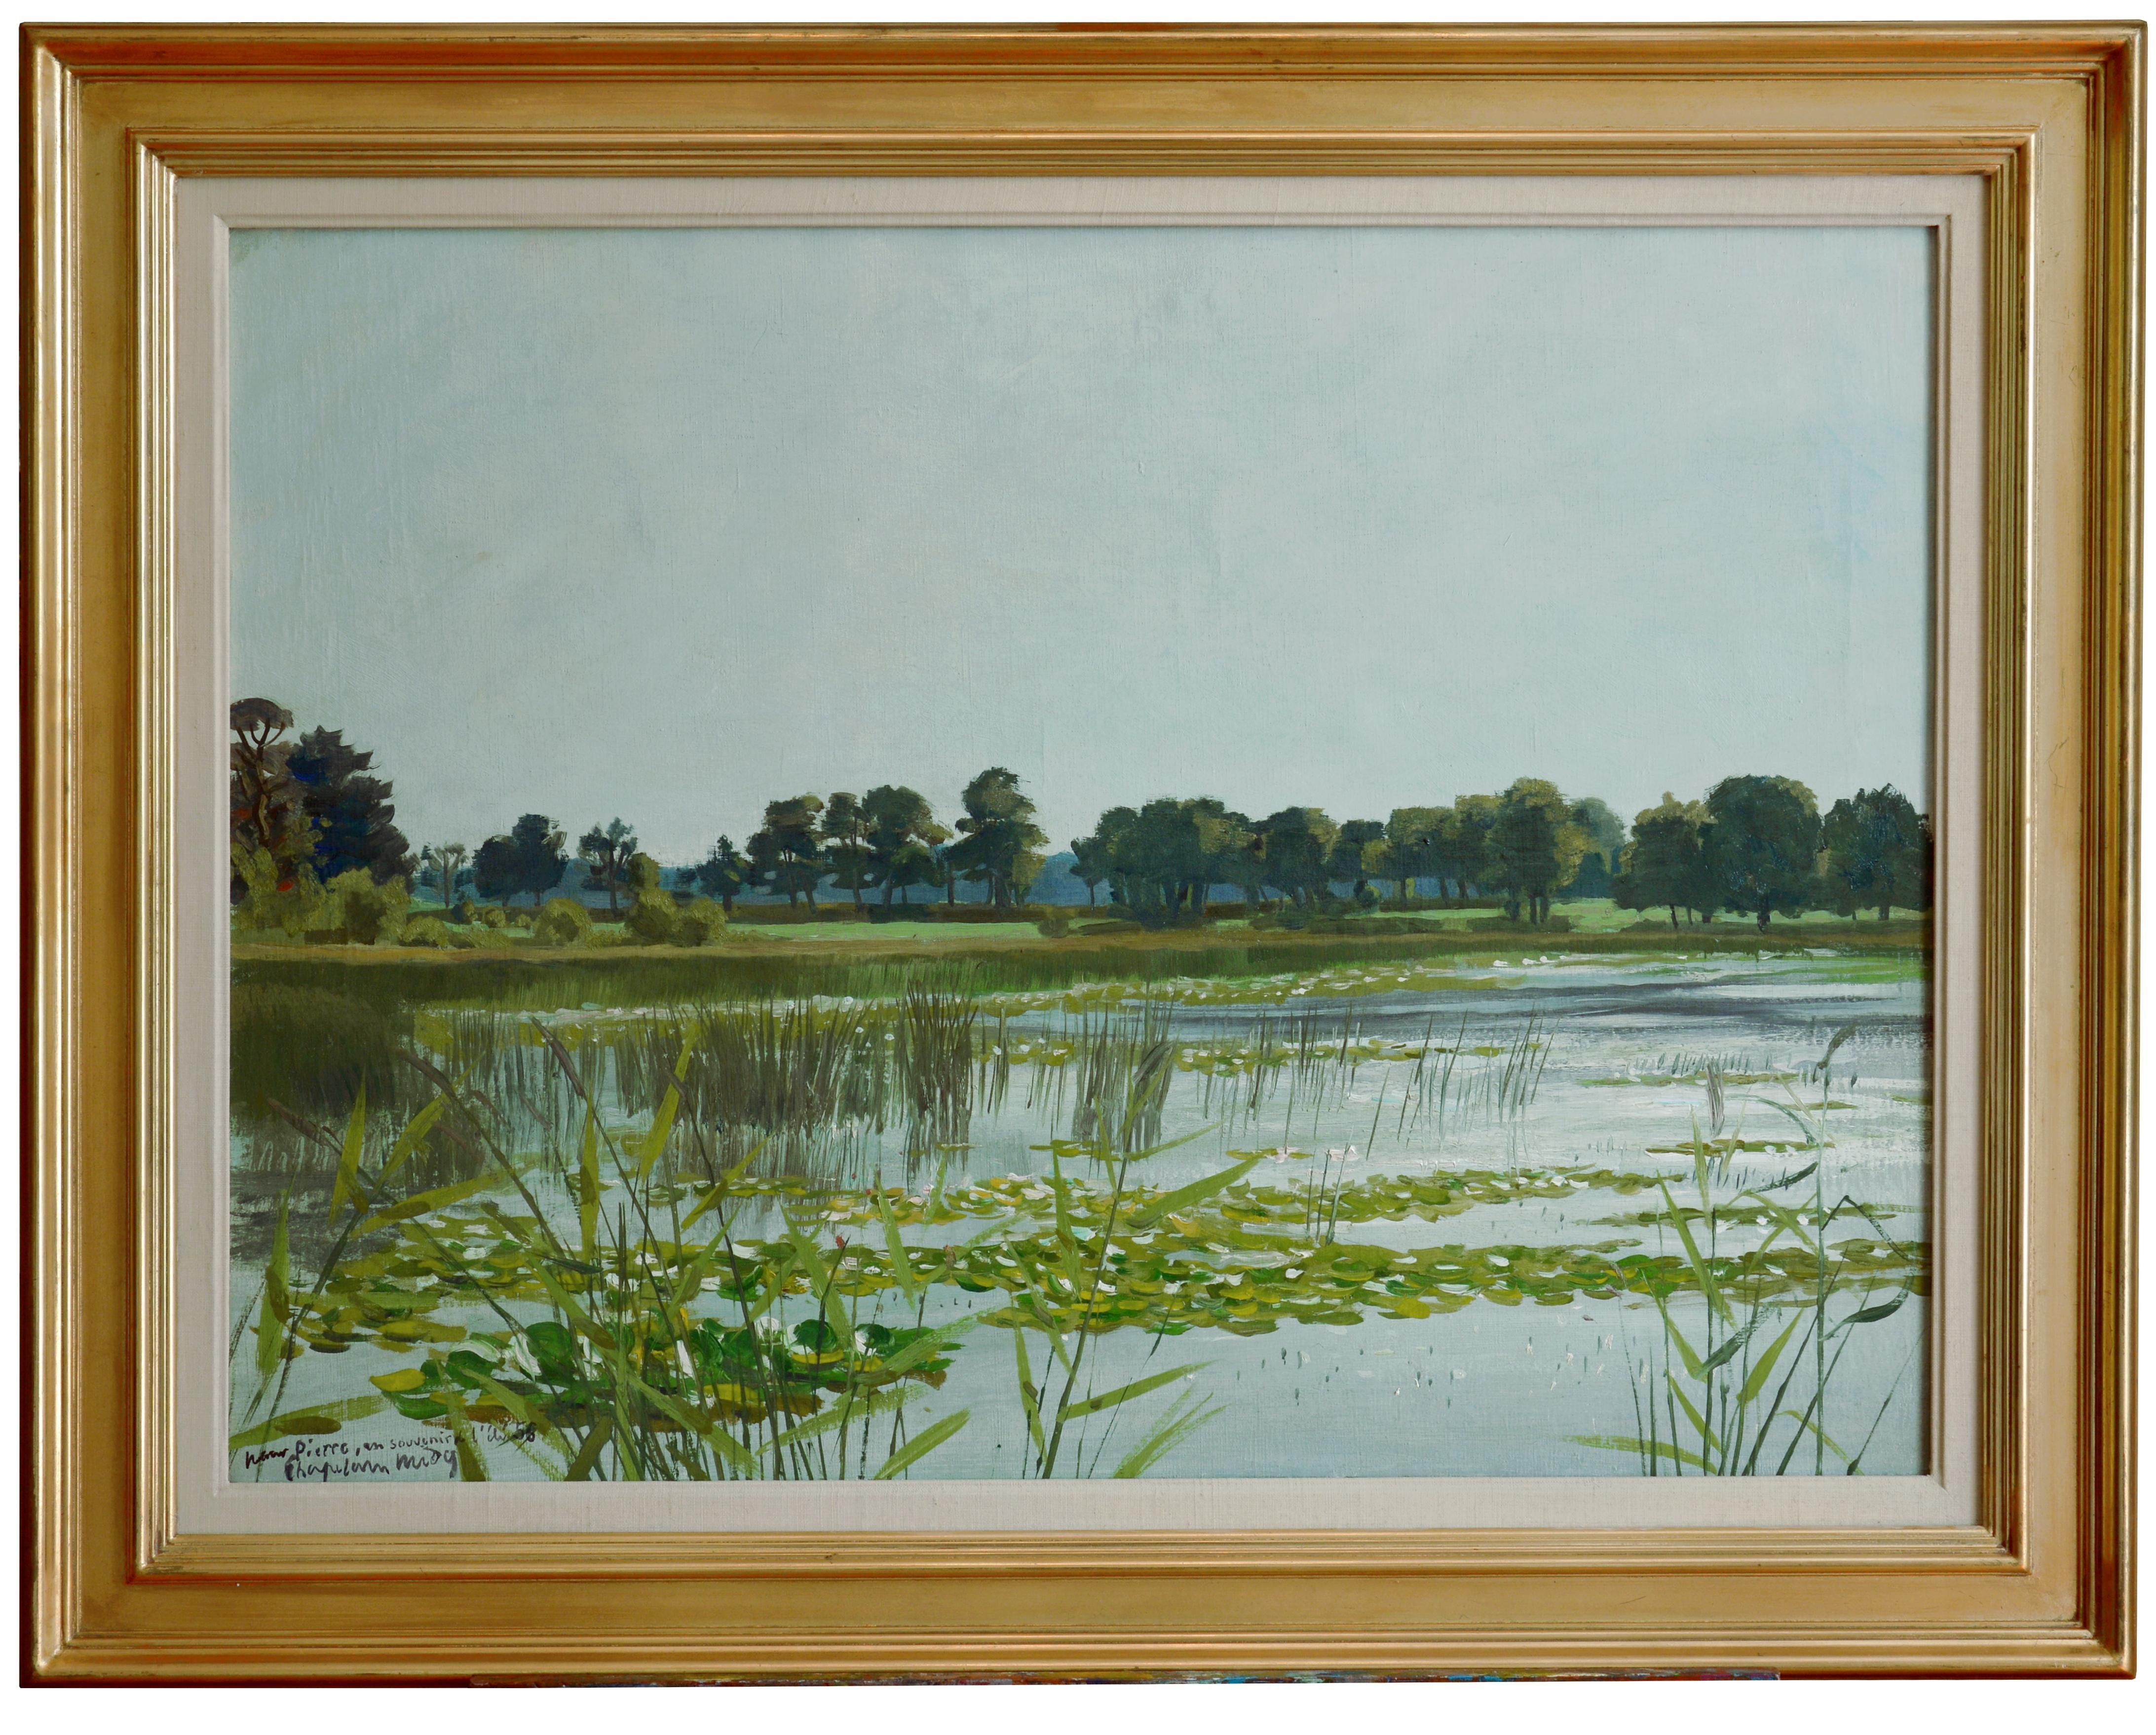 Roger Chapelain Midy, The Pool, Oil on Canvas